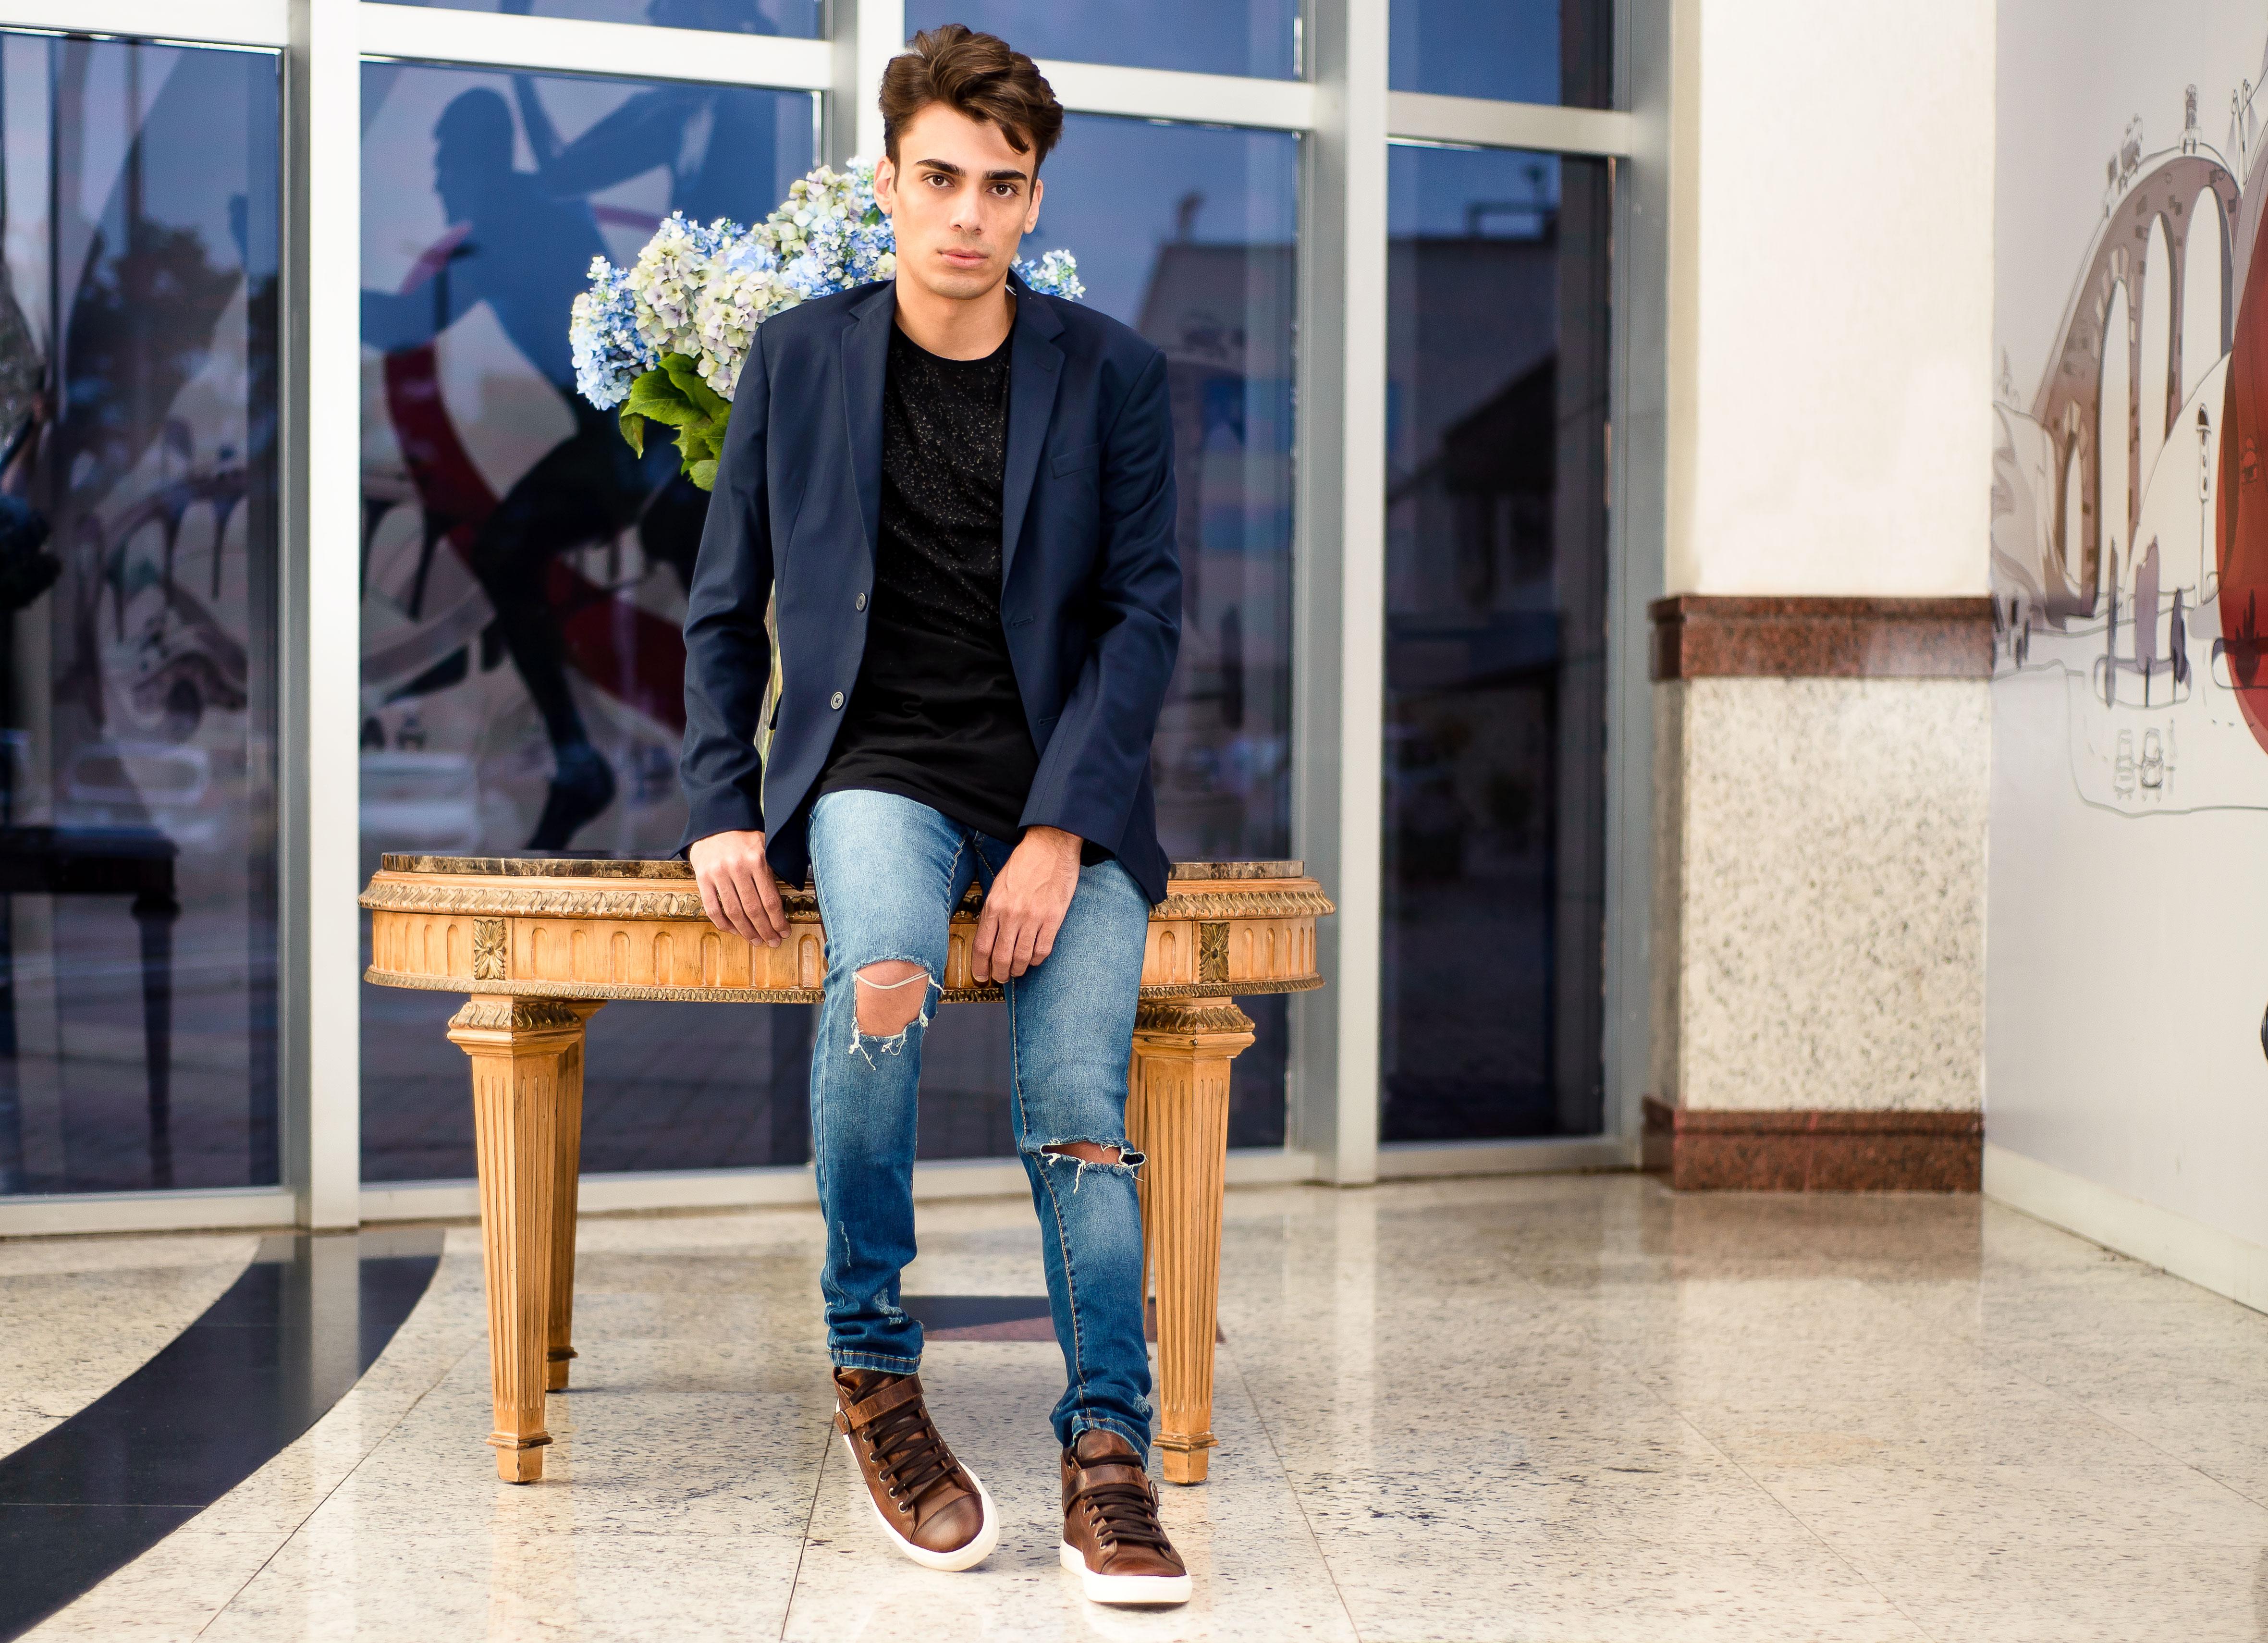 alex cursino, clooset, camila coelho, f hits, patricia abravanel, menswear, blog de moda, blogger, fashion blogger, mens, dicas de moda, roupa masculina, (3)